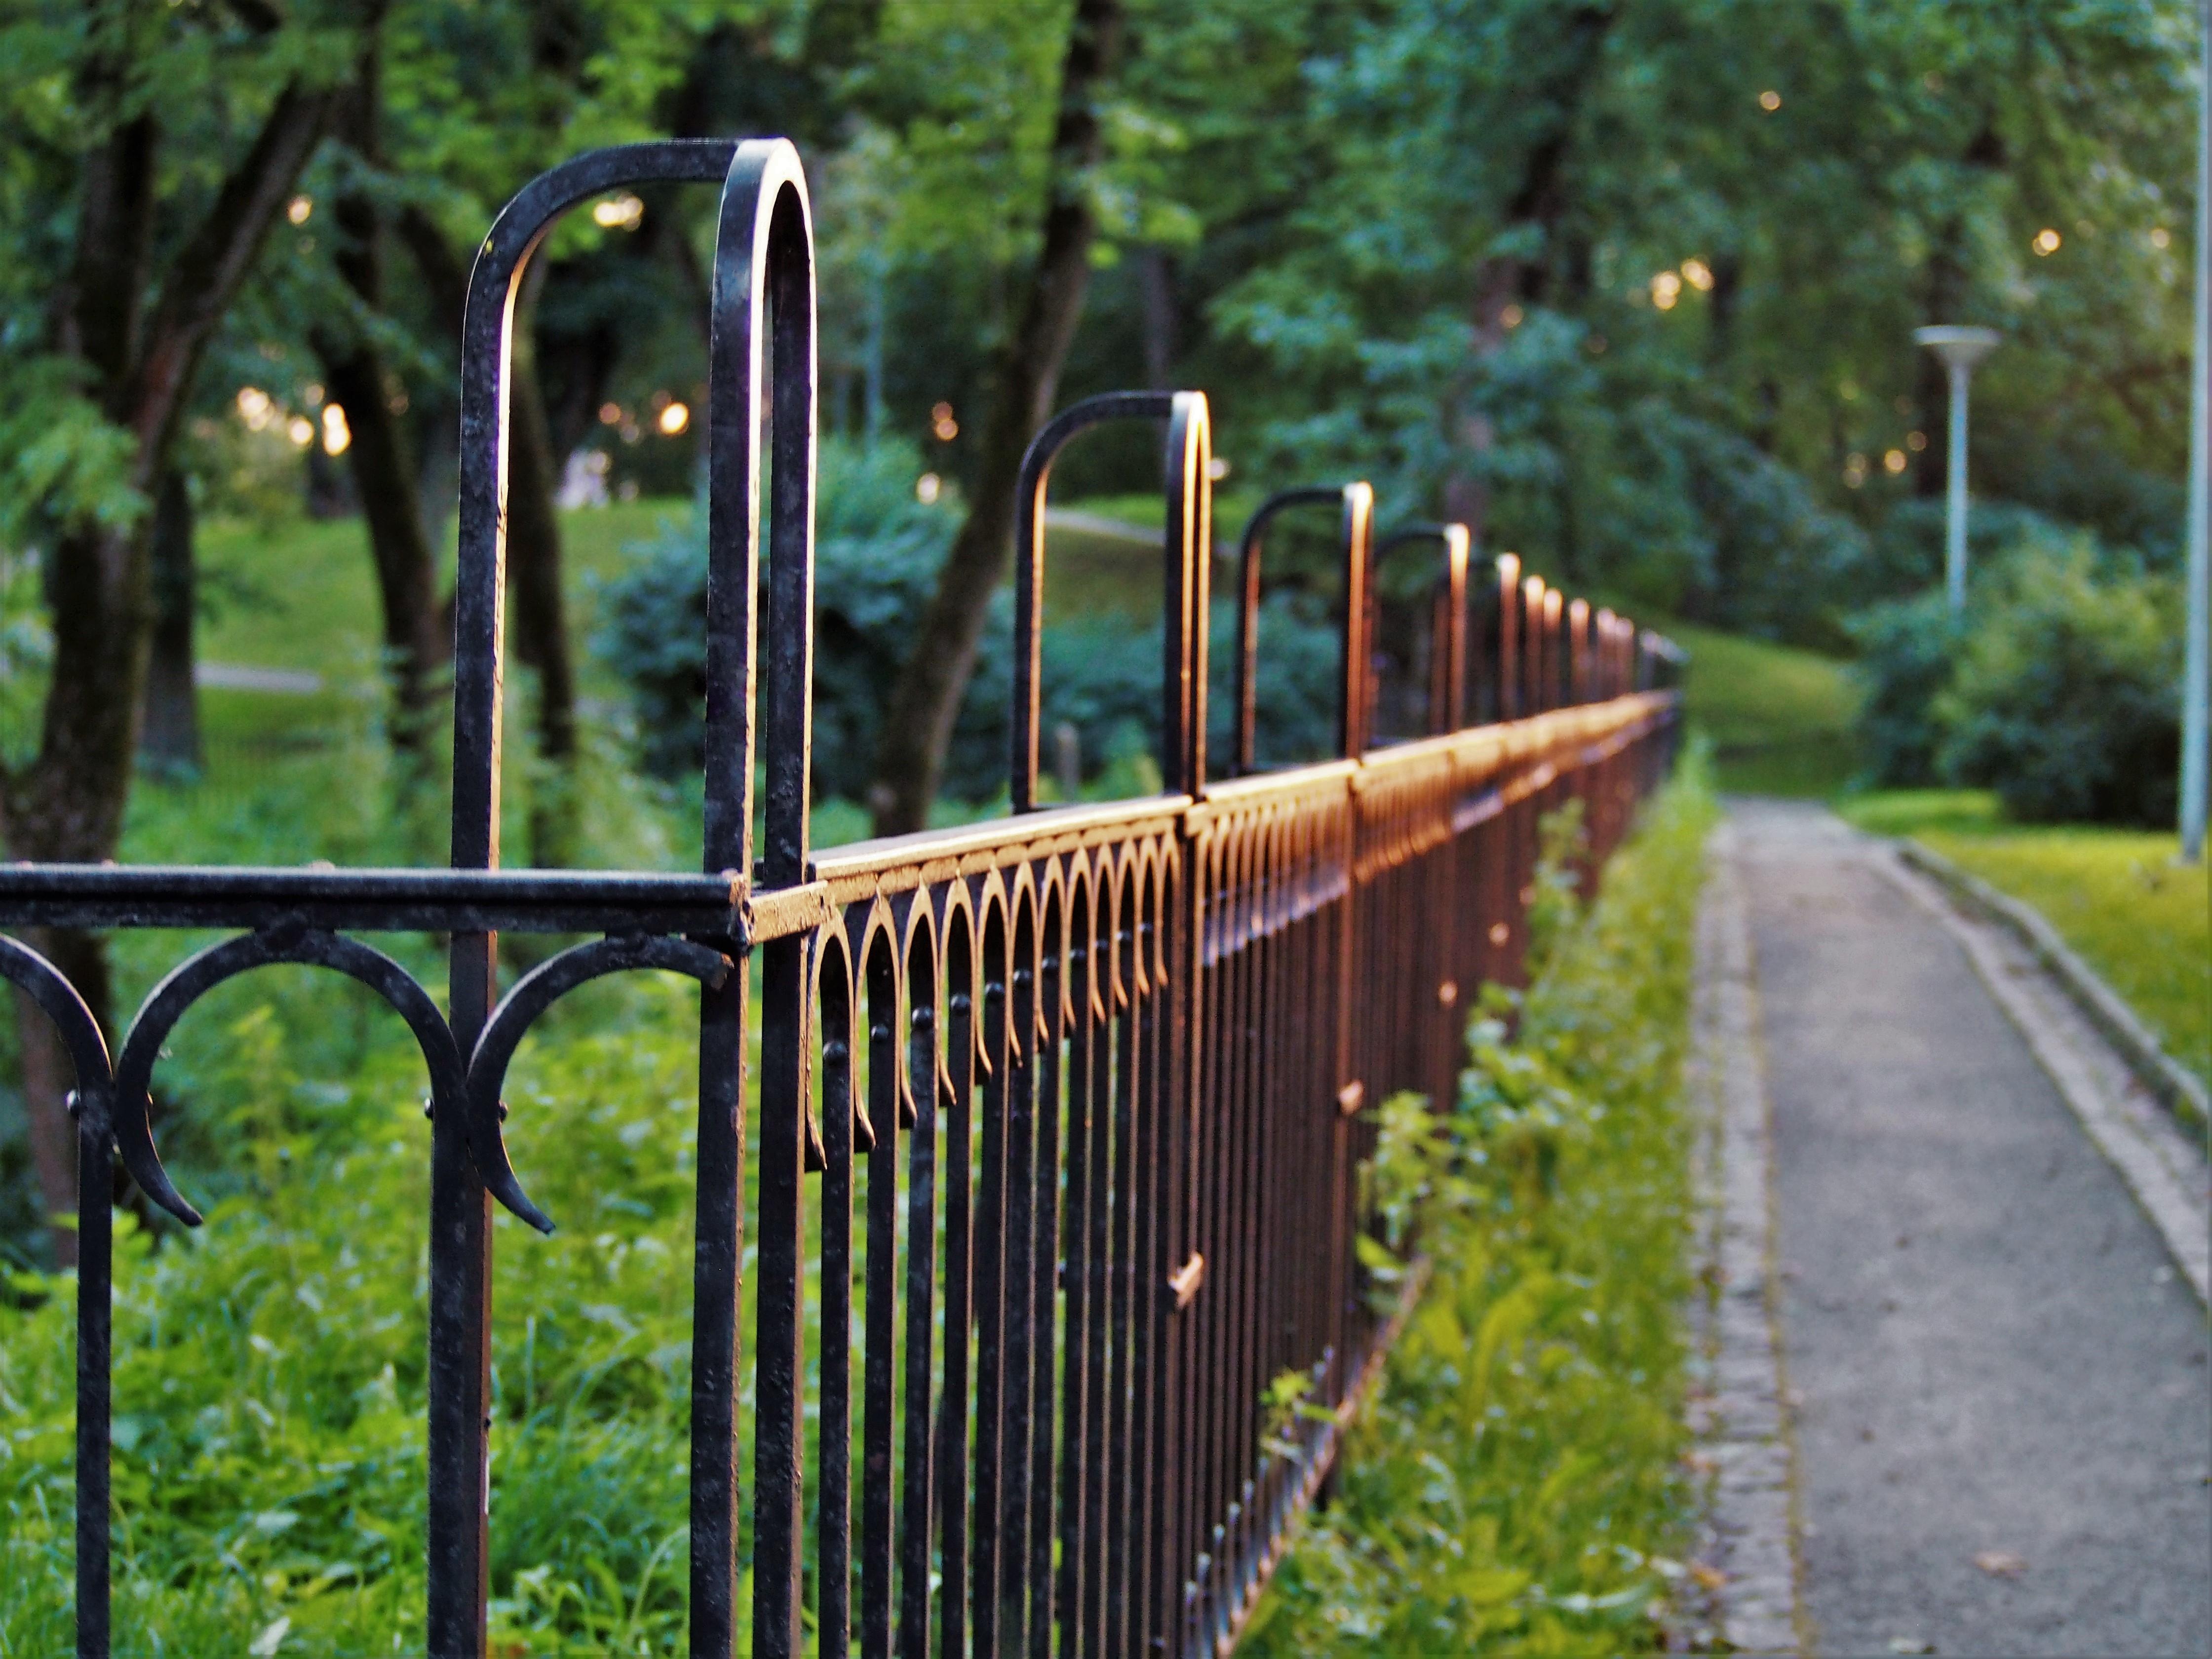 Black Metal Fence Free Stock Photo